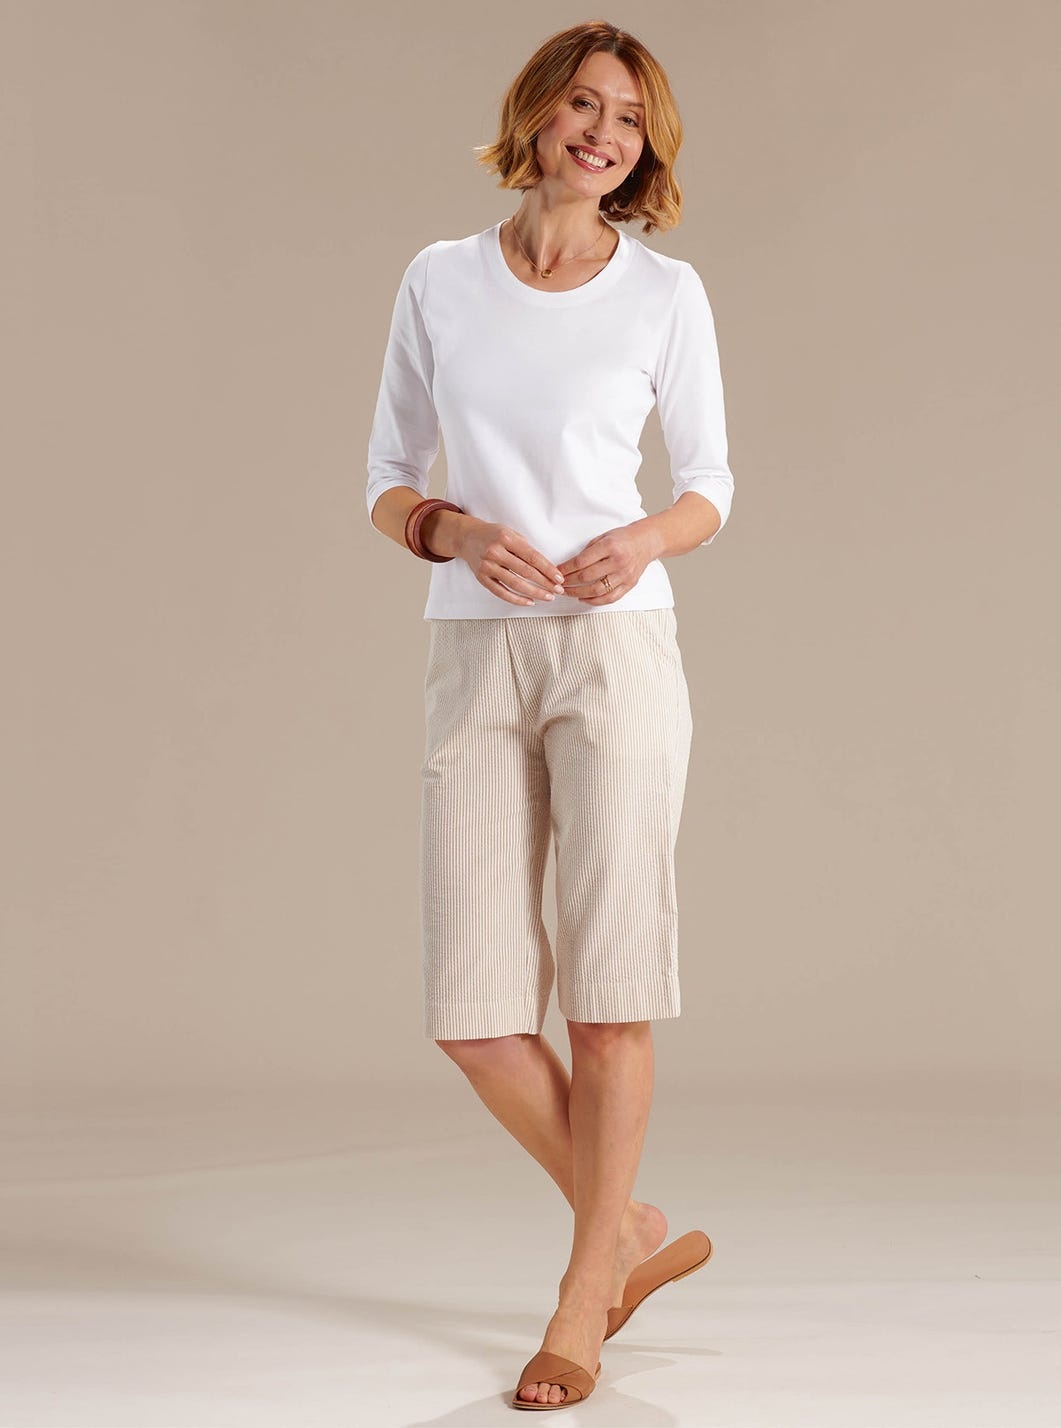 Striped Summer Shorts